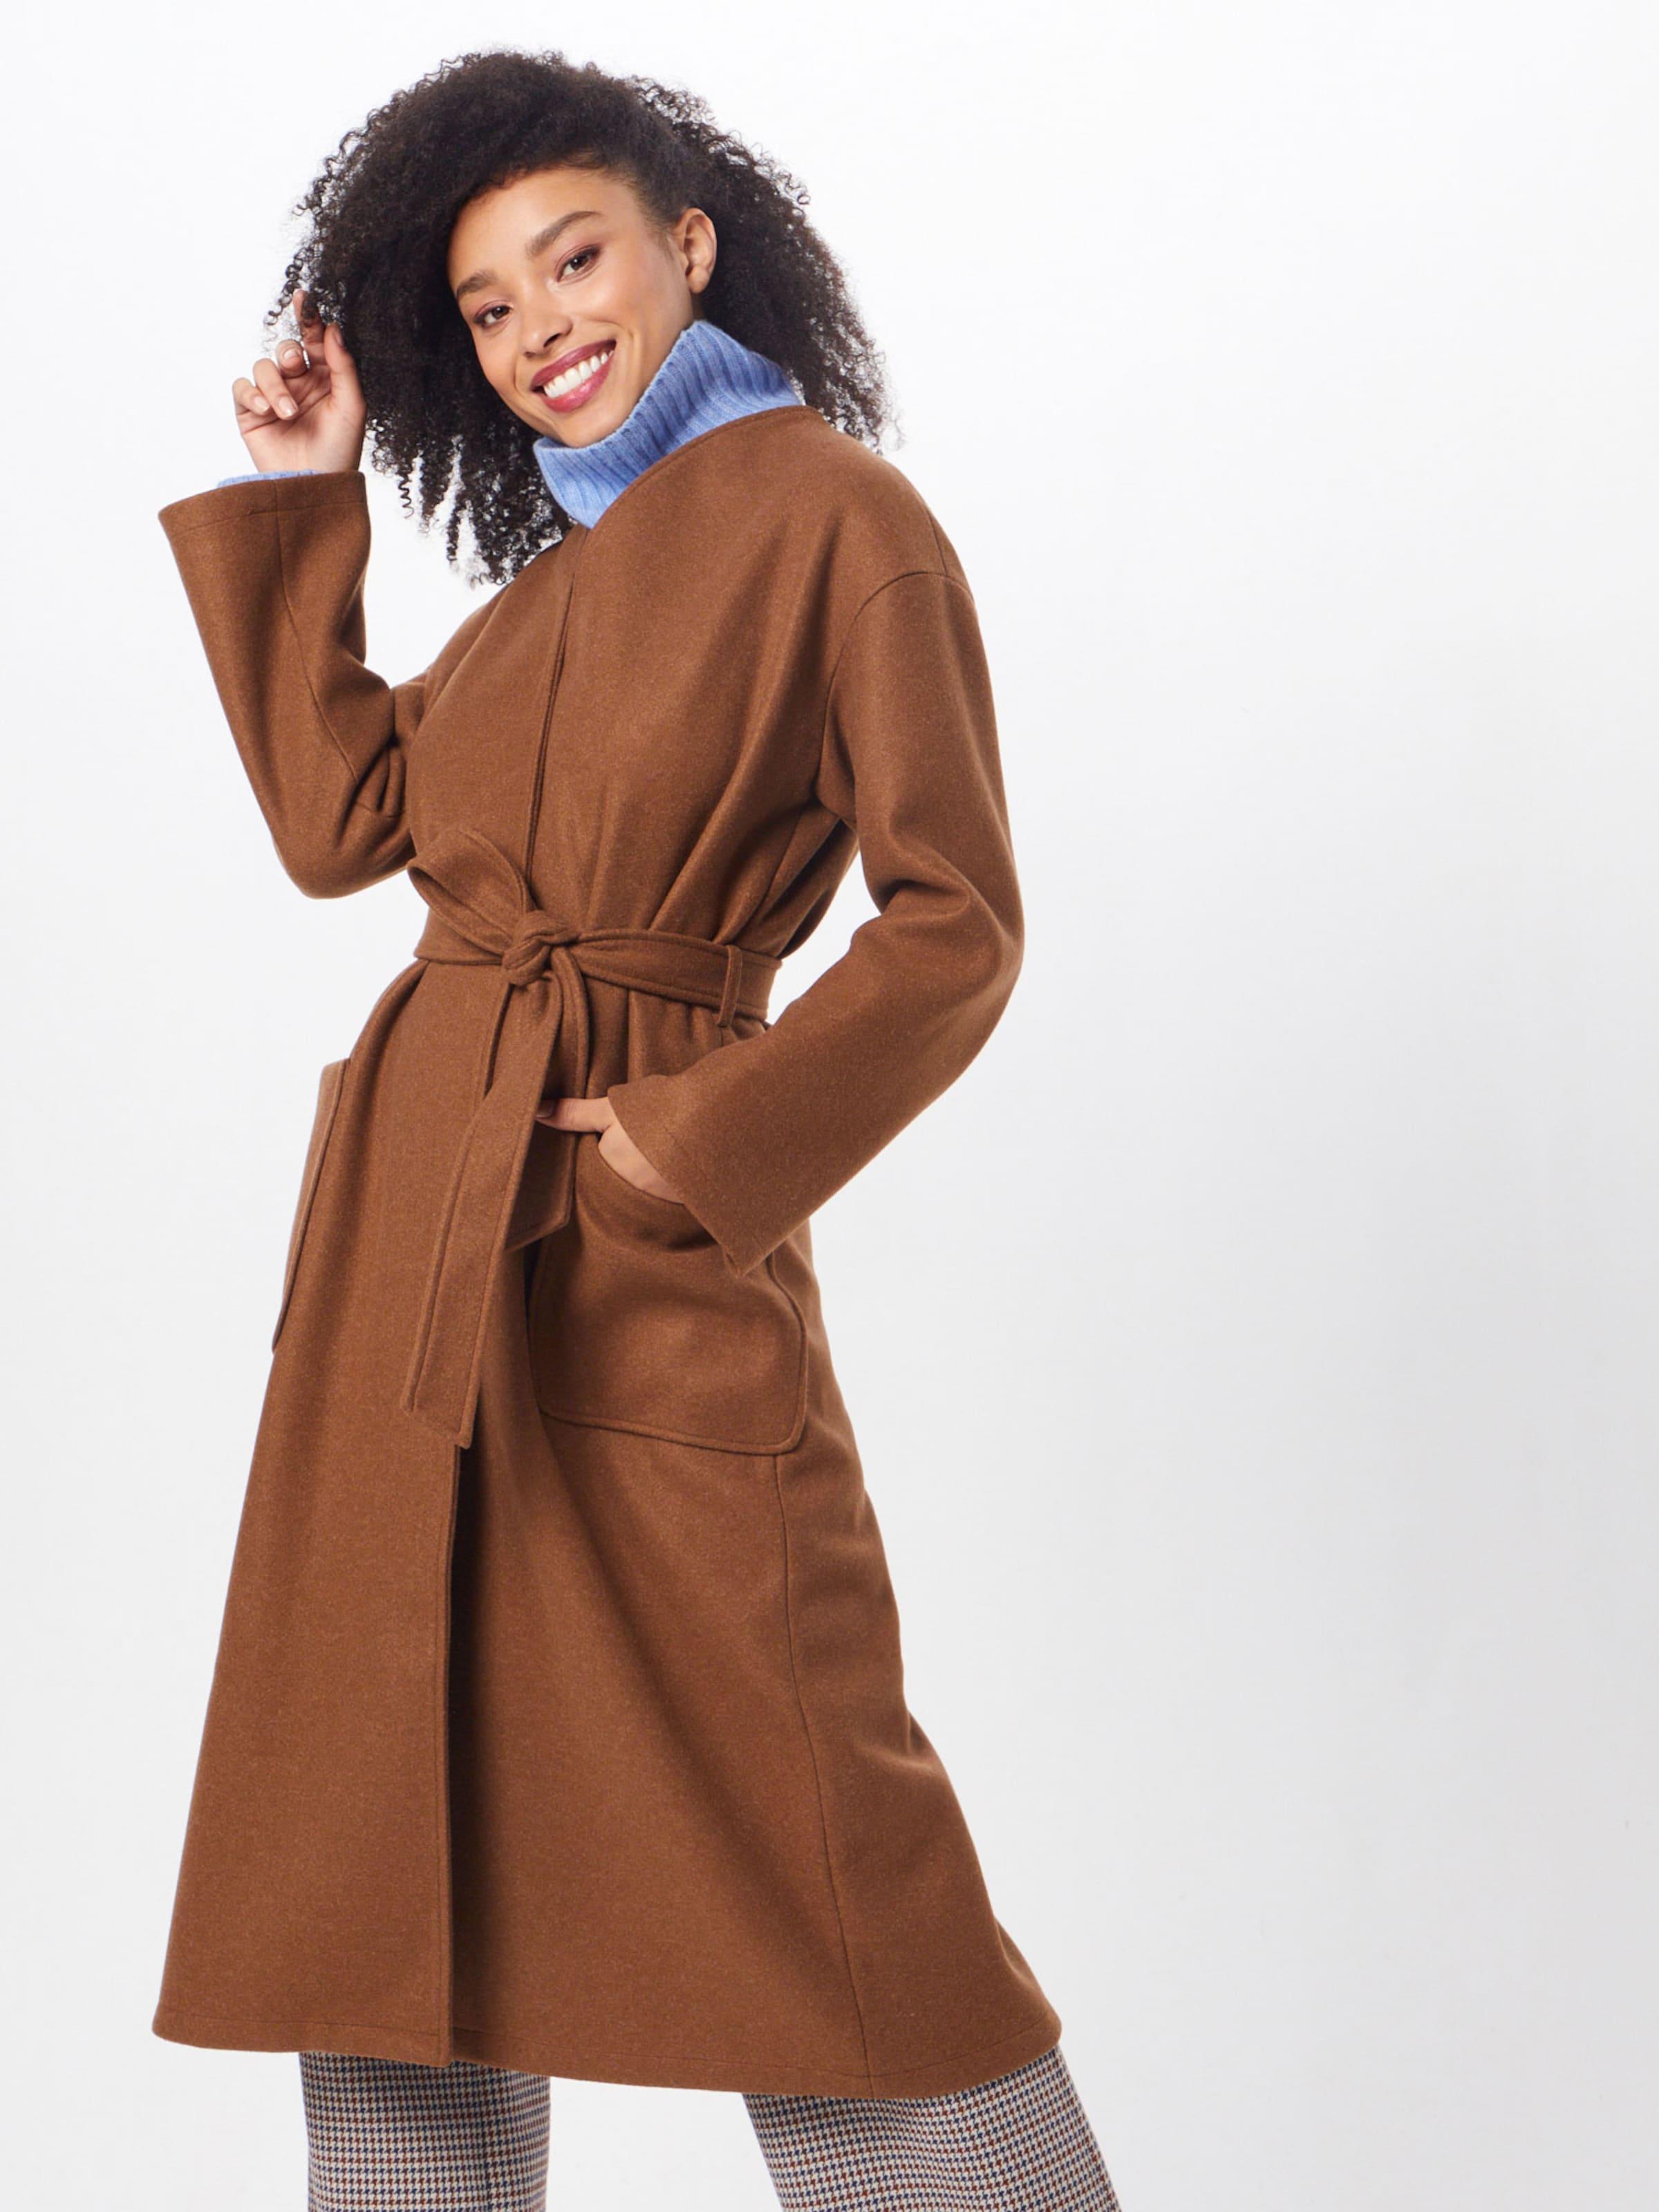 Mäntel Fashion In Union 'edgy' Camel zLSUpMVGq